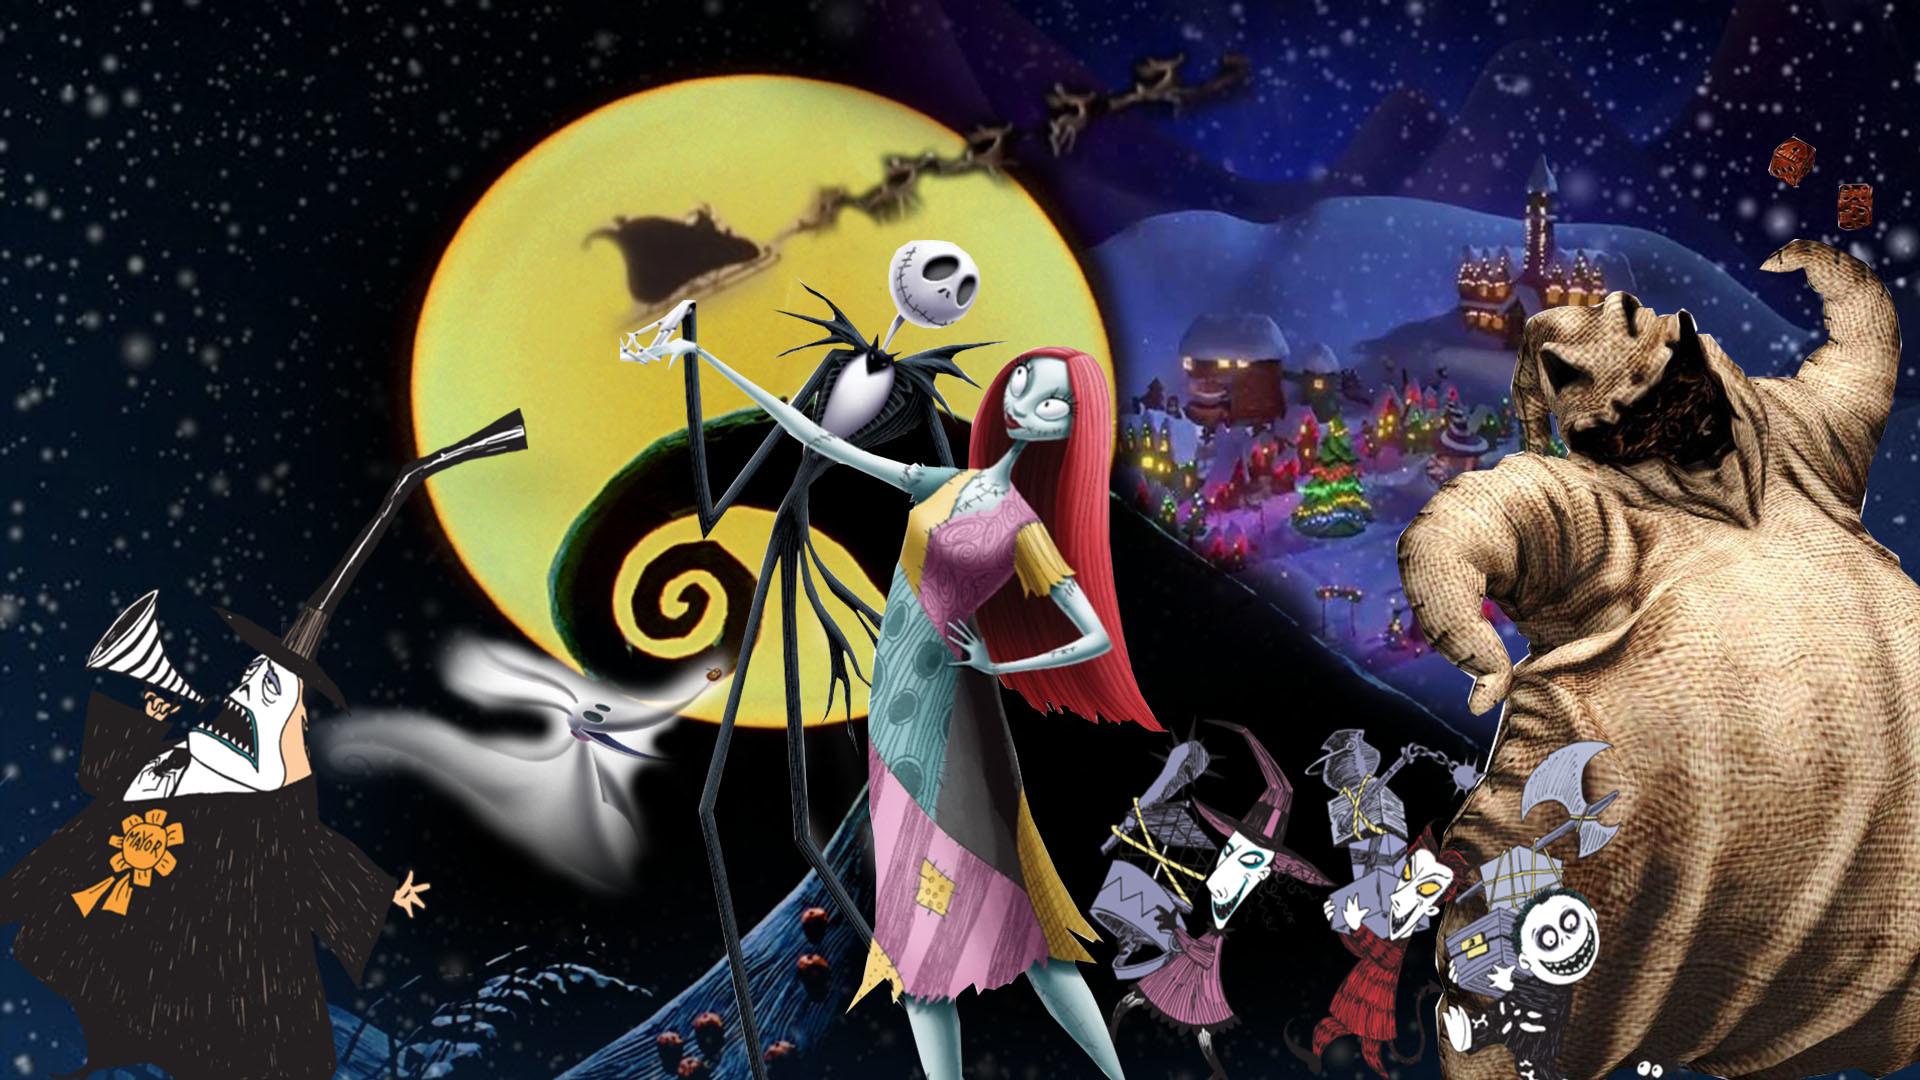 Nightmare Before Christmas Wallpaper 1080x1920